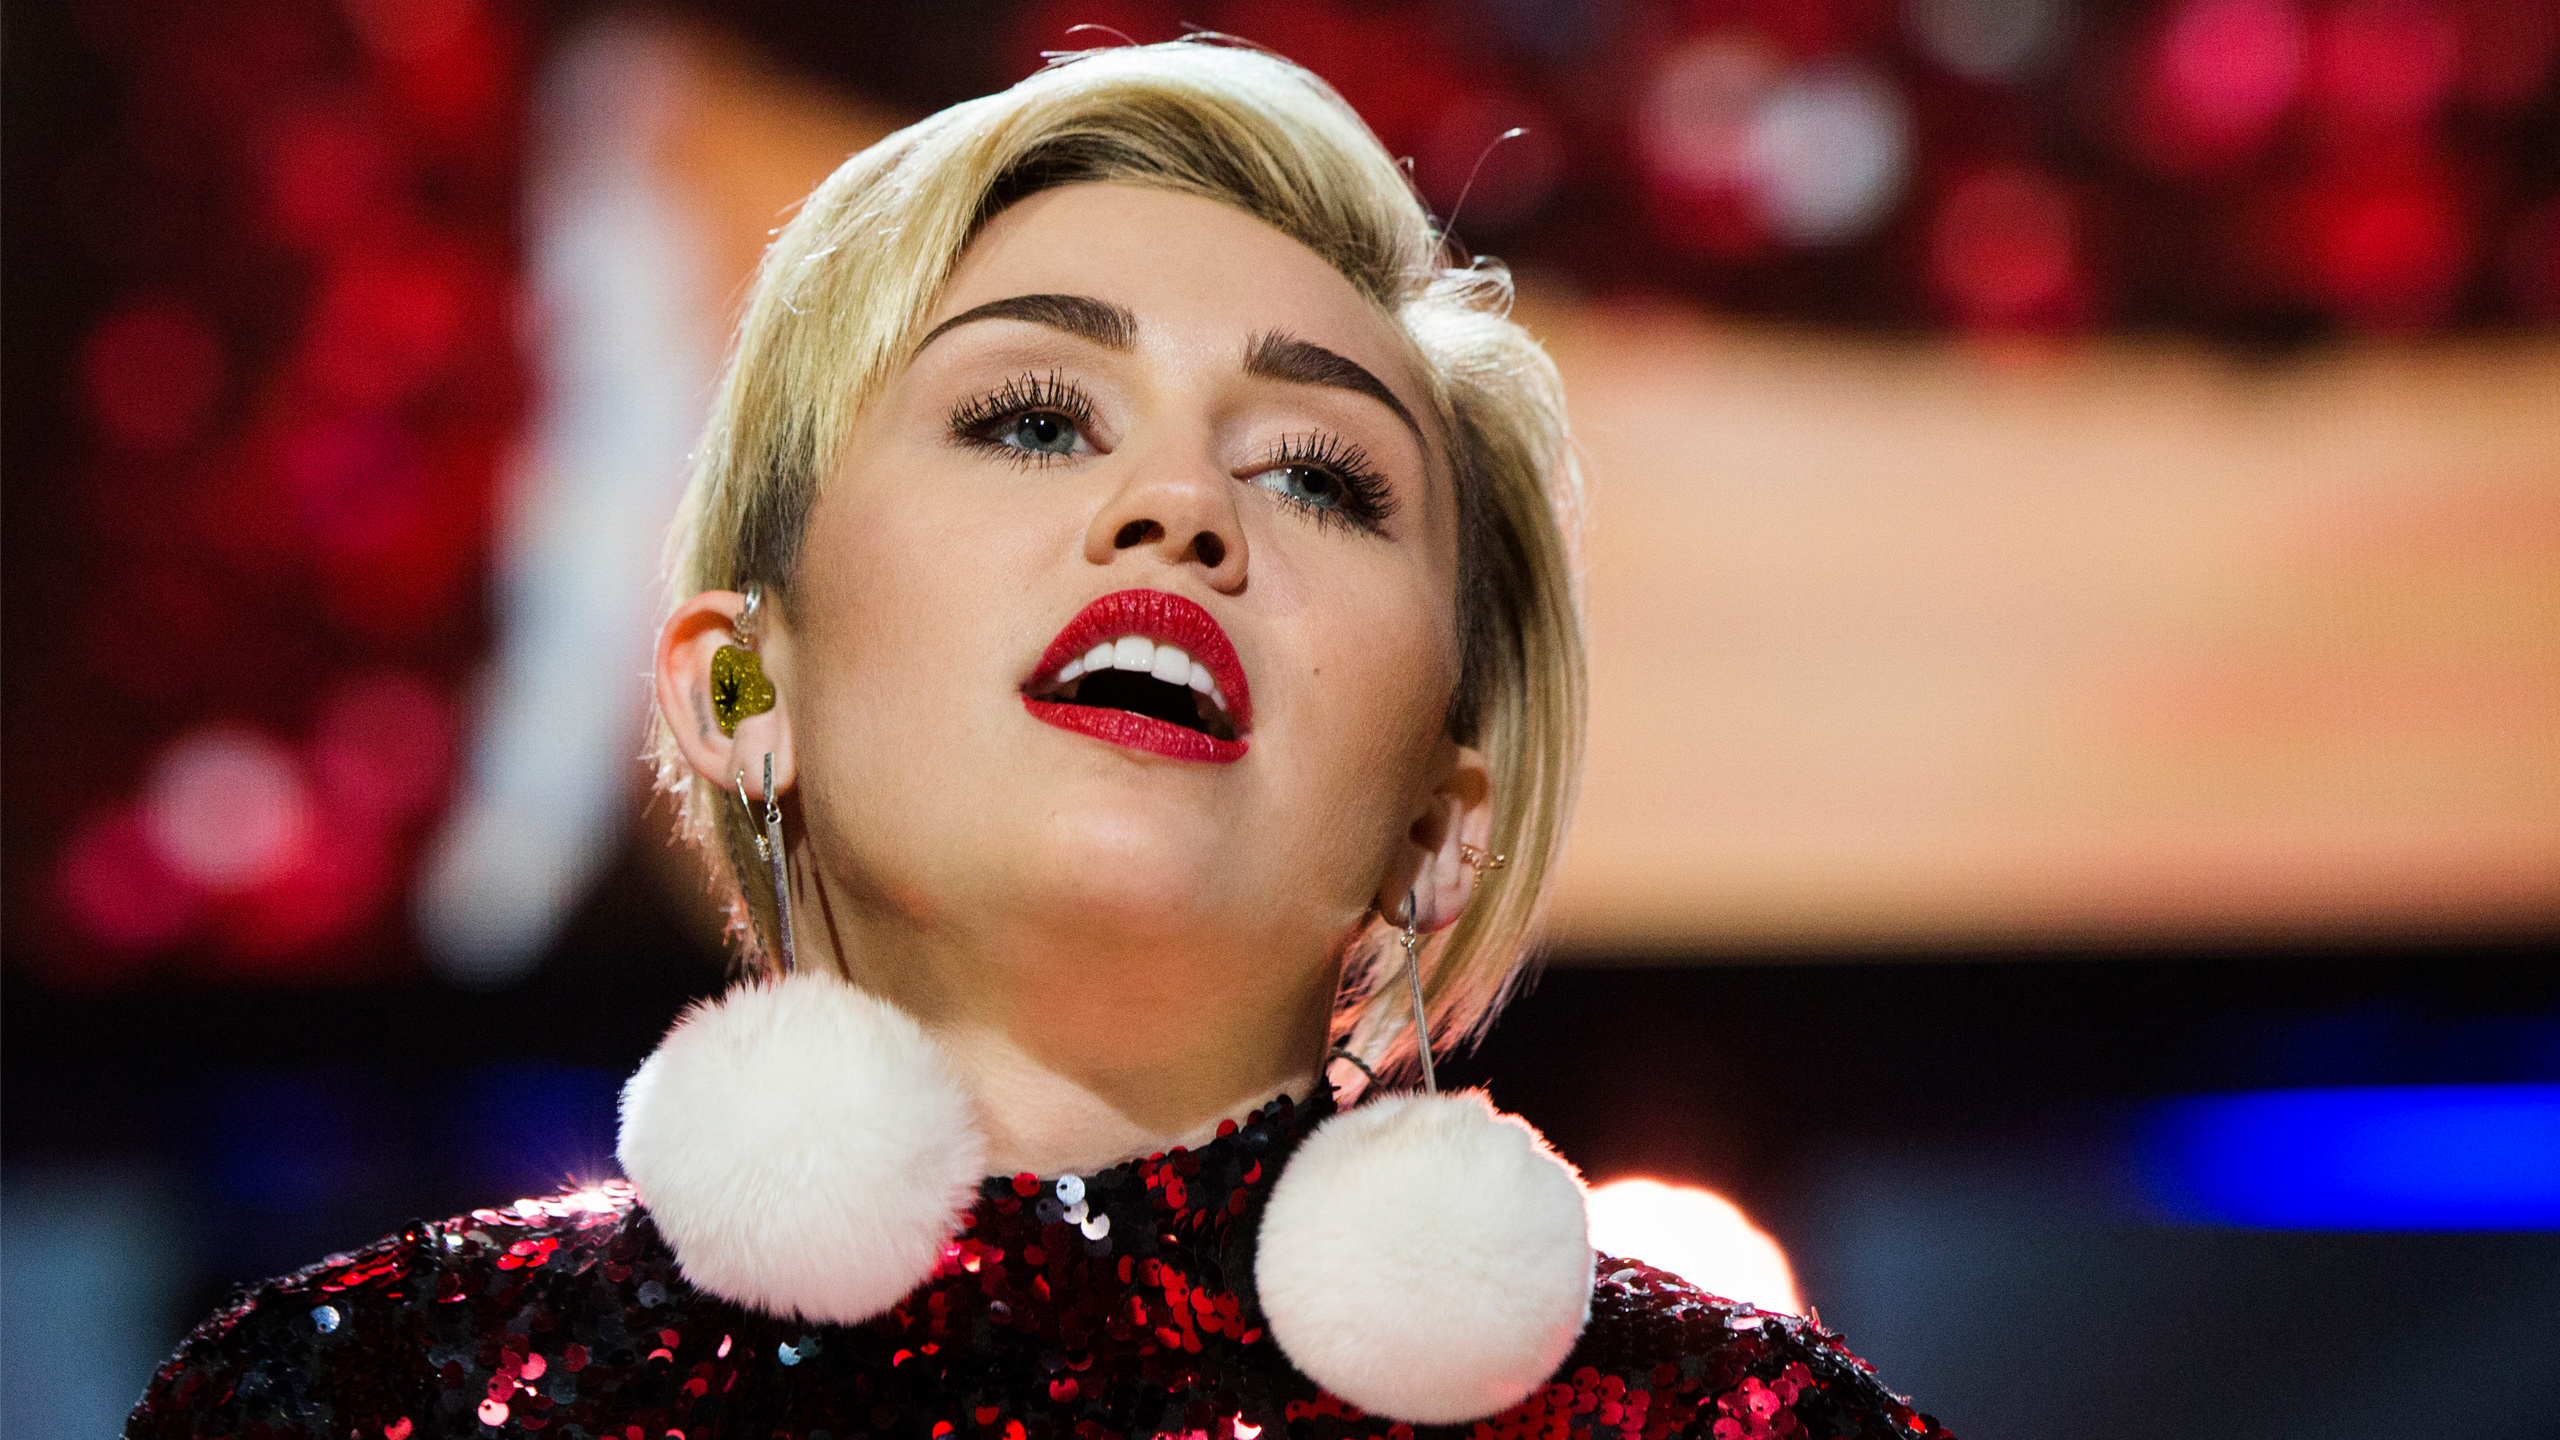 Miley Cyrus 84 HD wallpaper 2560x1440